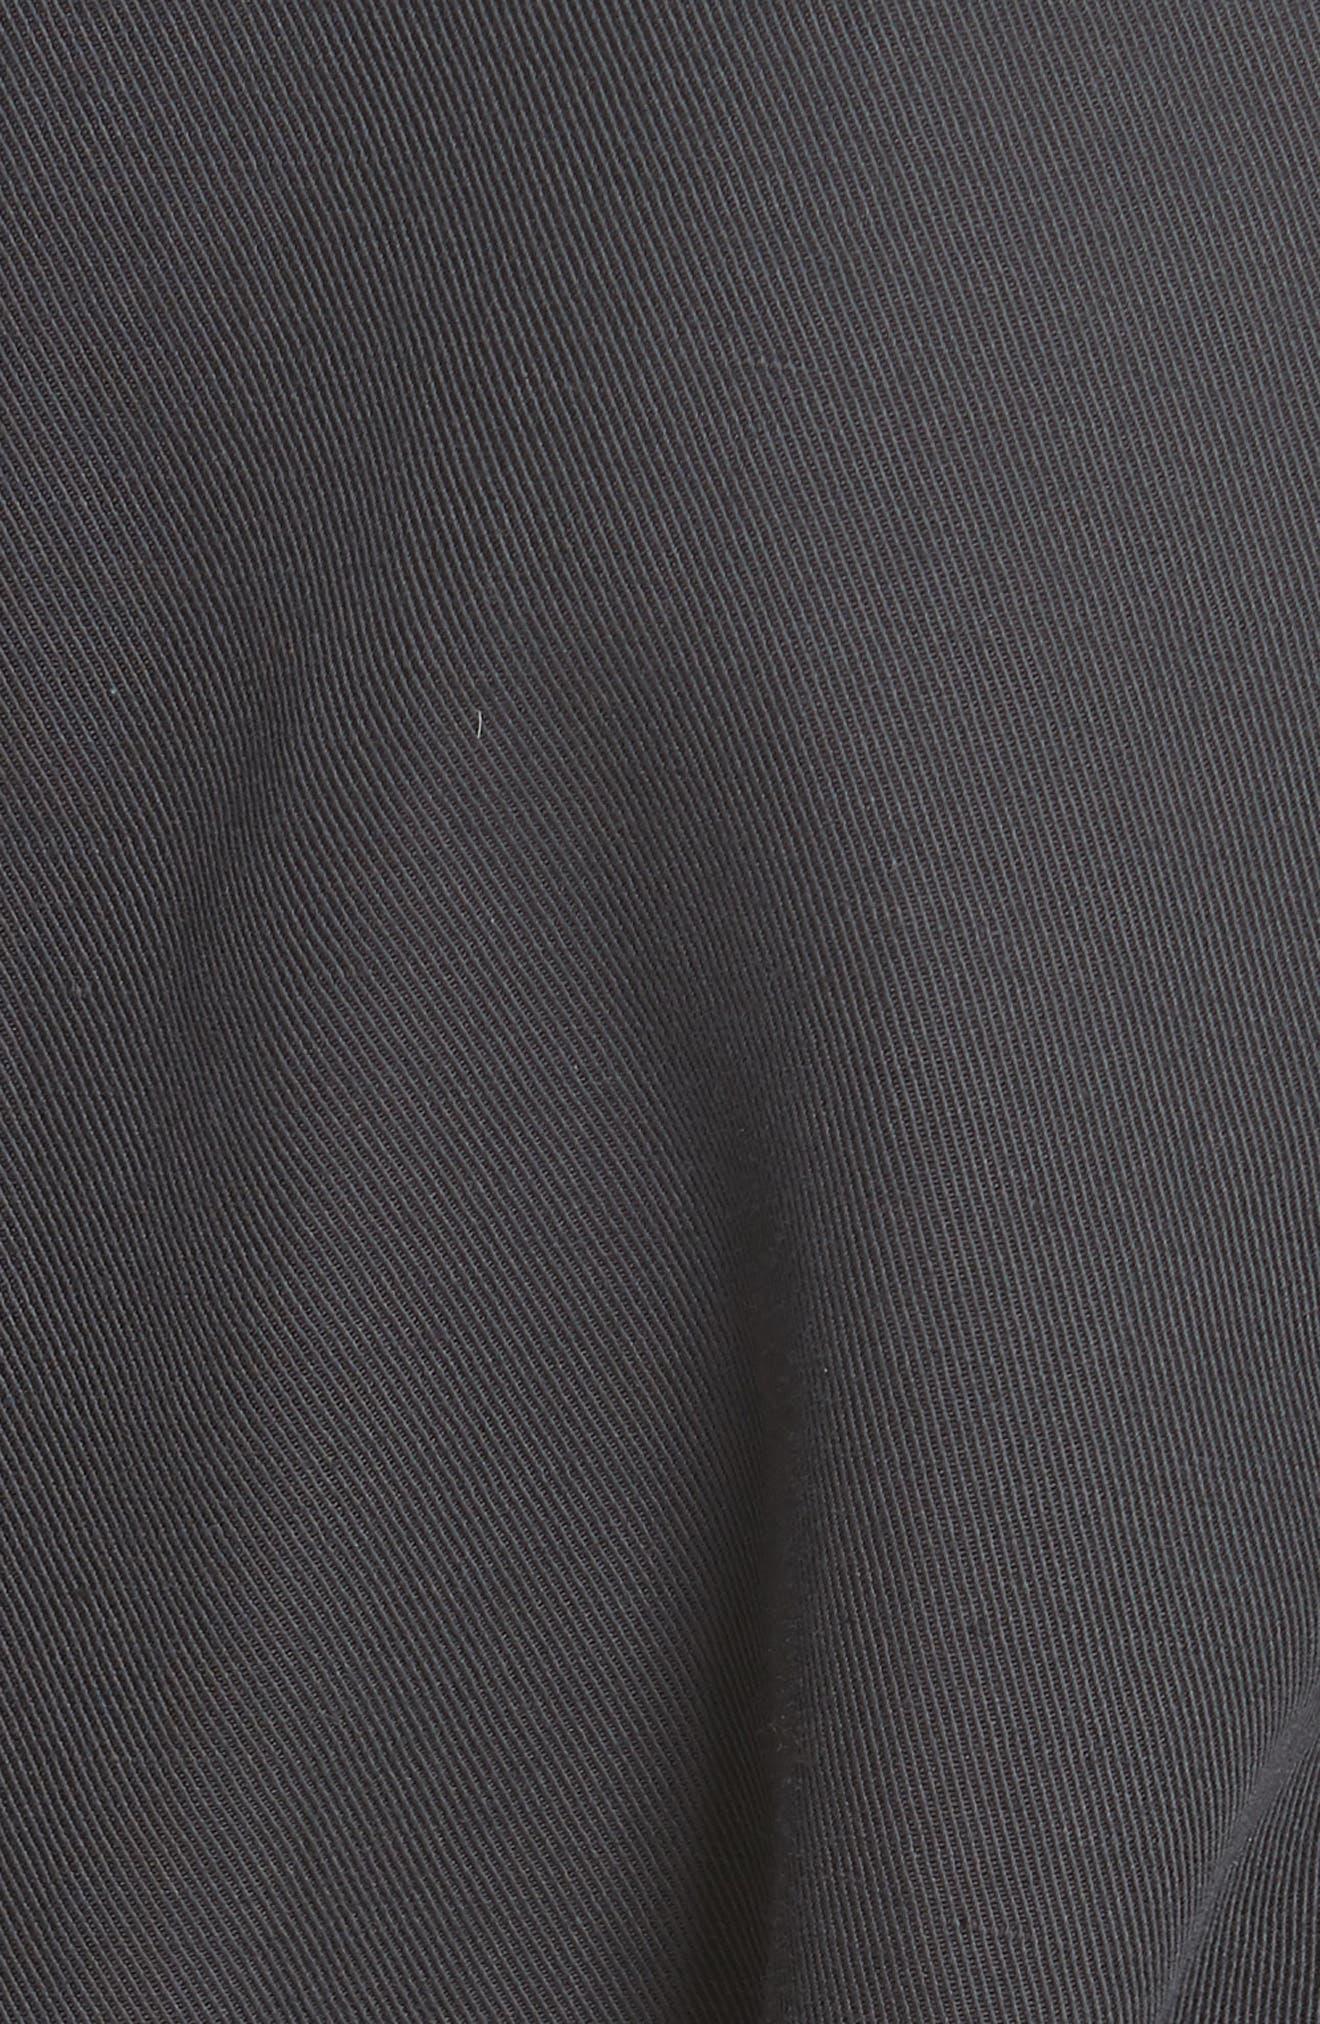 Belted Utility Jacket,                             Alternate thumbnail 3, color,                             Slate